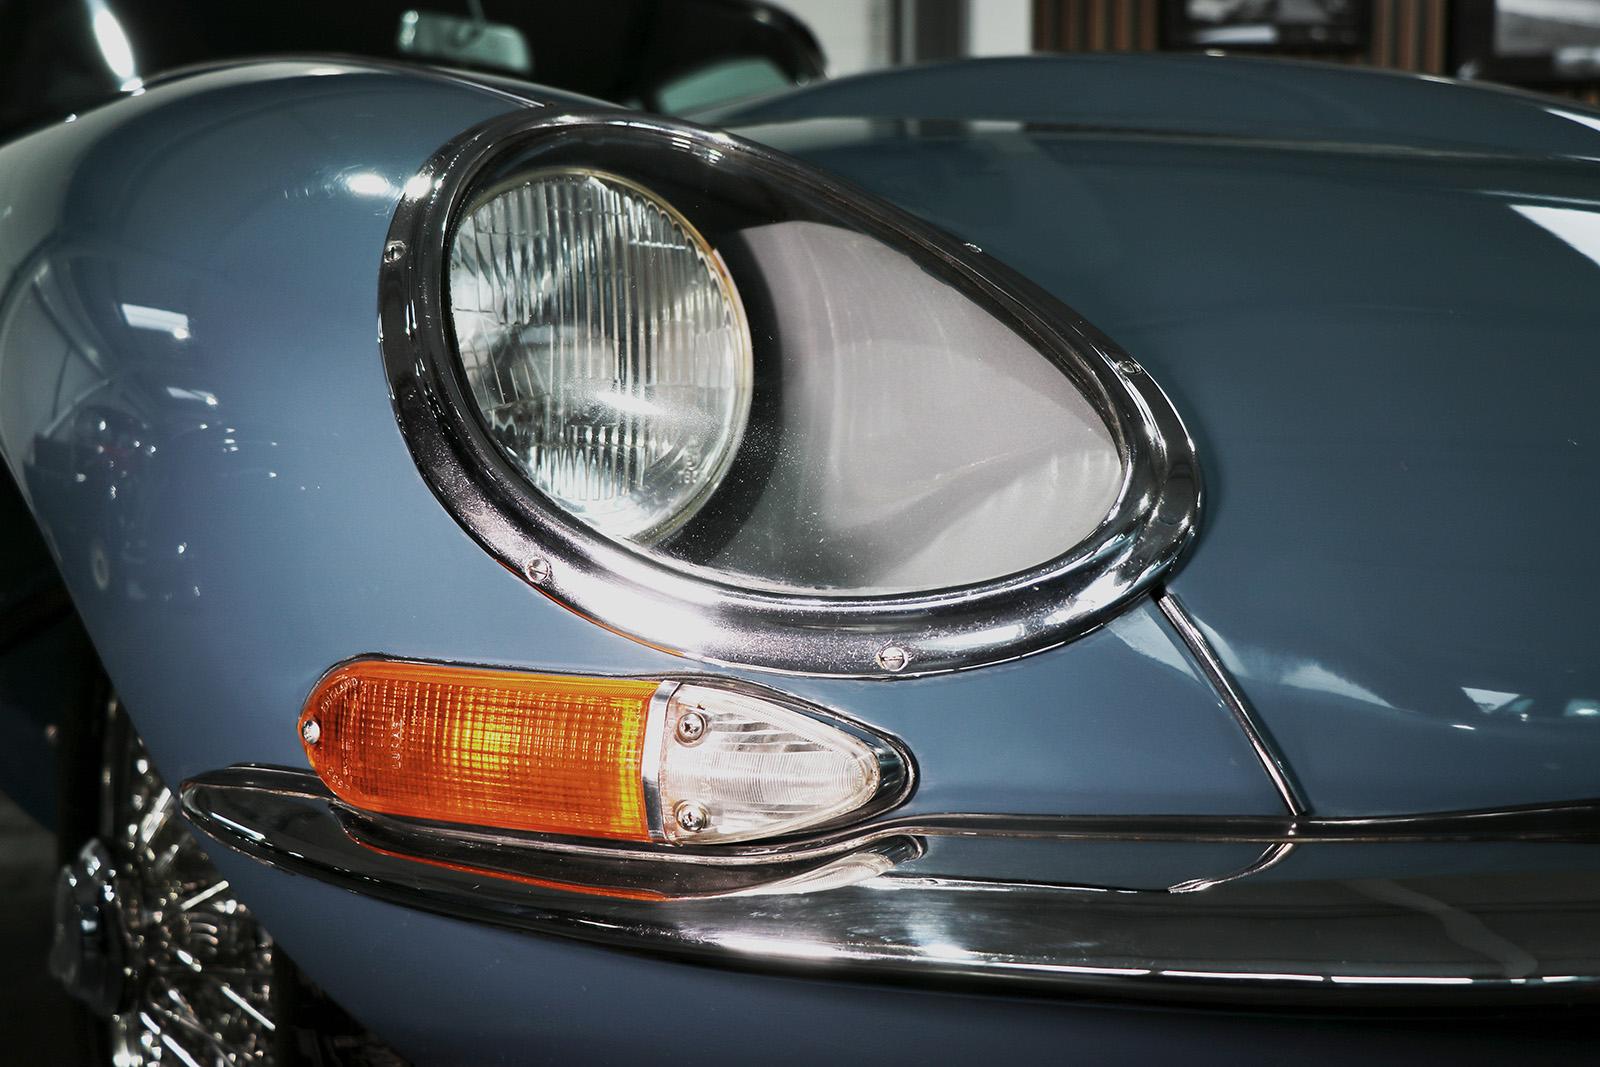 1963_cotswold_blue_series 1_jaguar_etype_sayer_selection_wilkinson_web_3.jpg